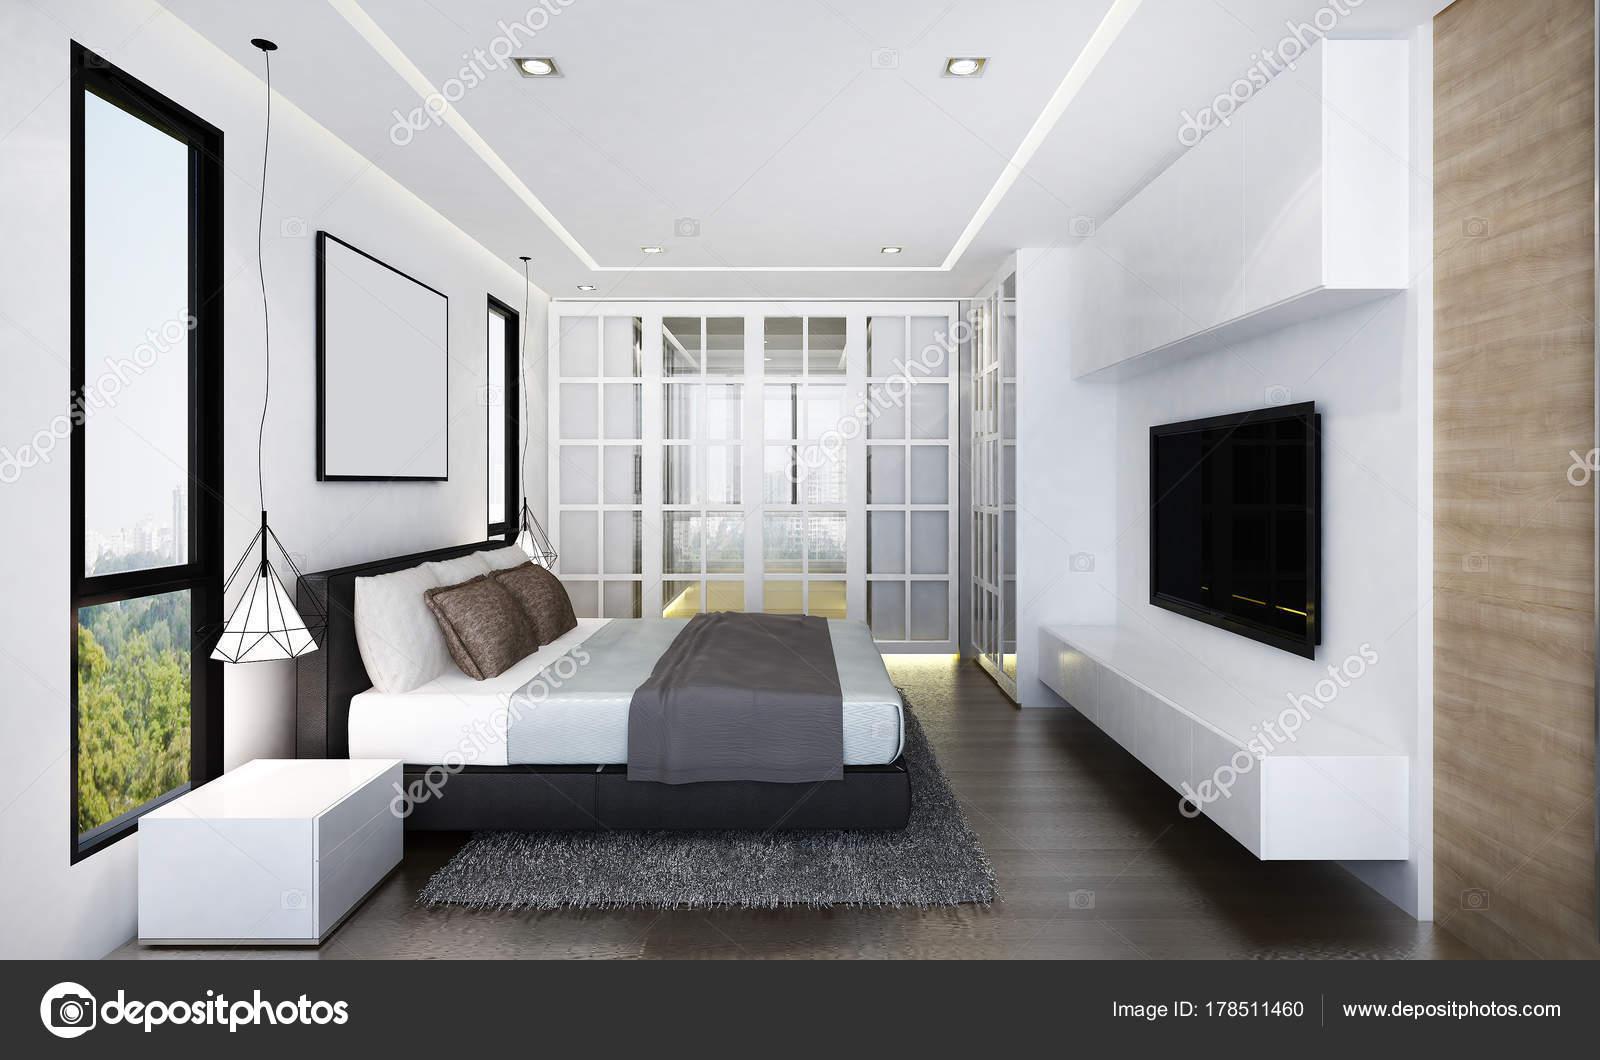 Rendering interieur concept idee van moderne slaapkamer muur